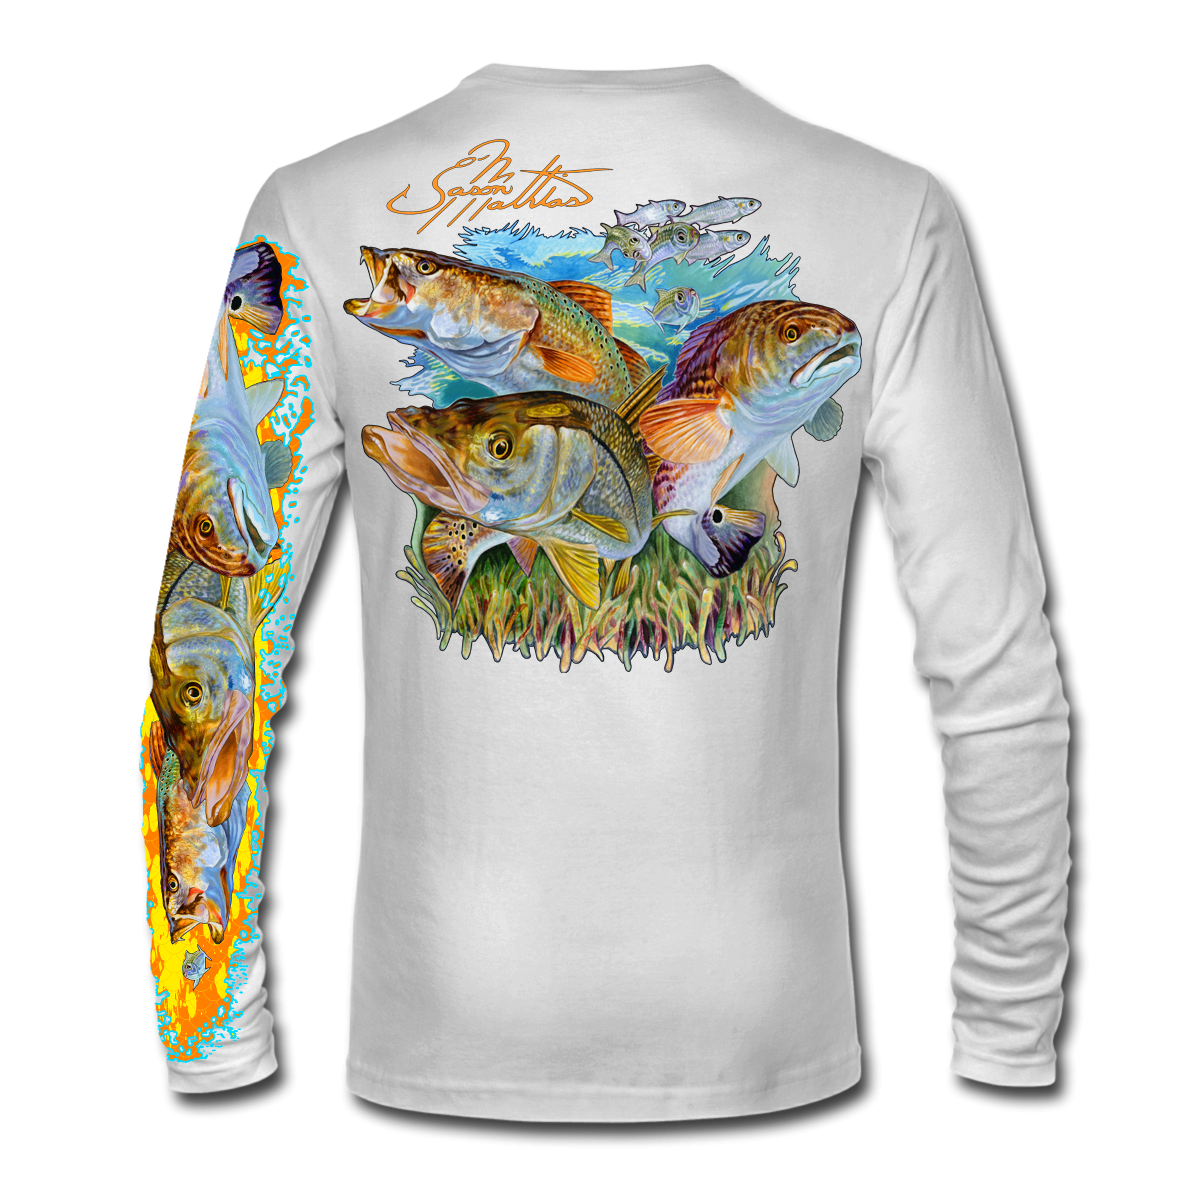 inshore-slam-snook-redfish-trout-shirt-jason-mathias-white-back.png